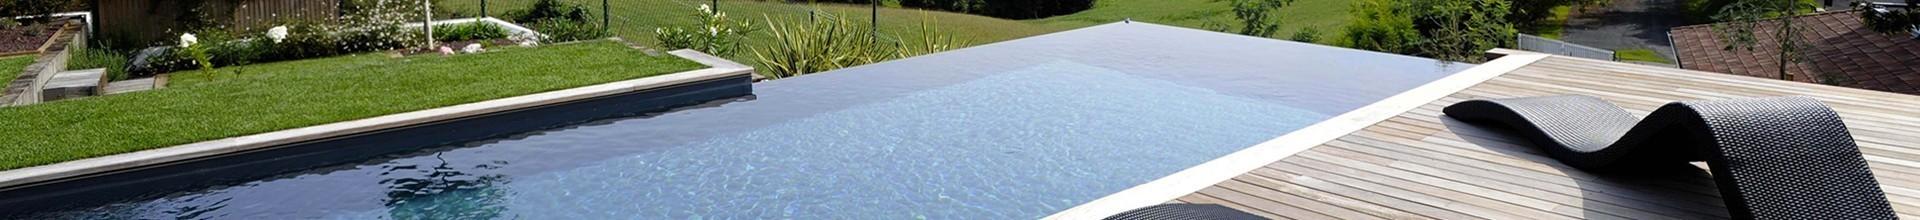 ✅ Rhône Alpes Kit piscine béton Savoie. Fabricant